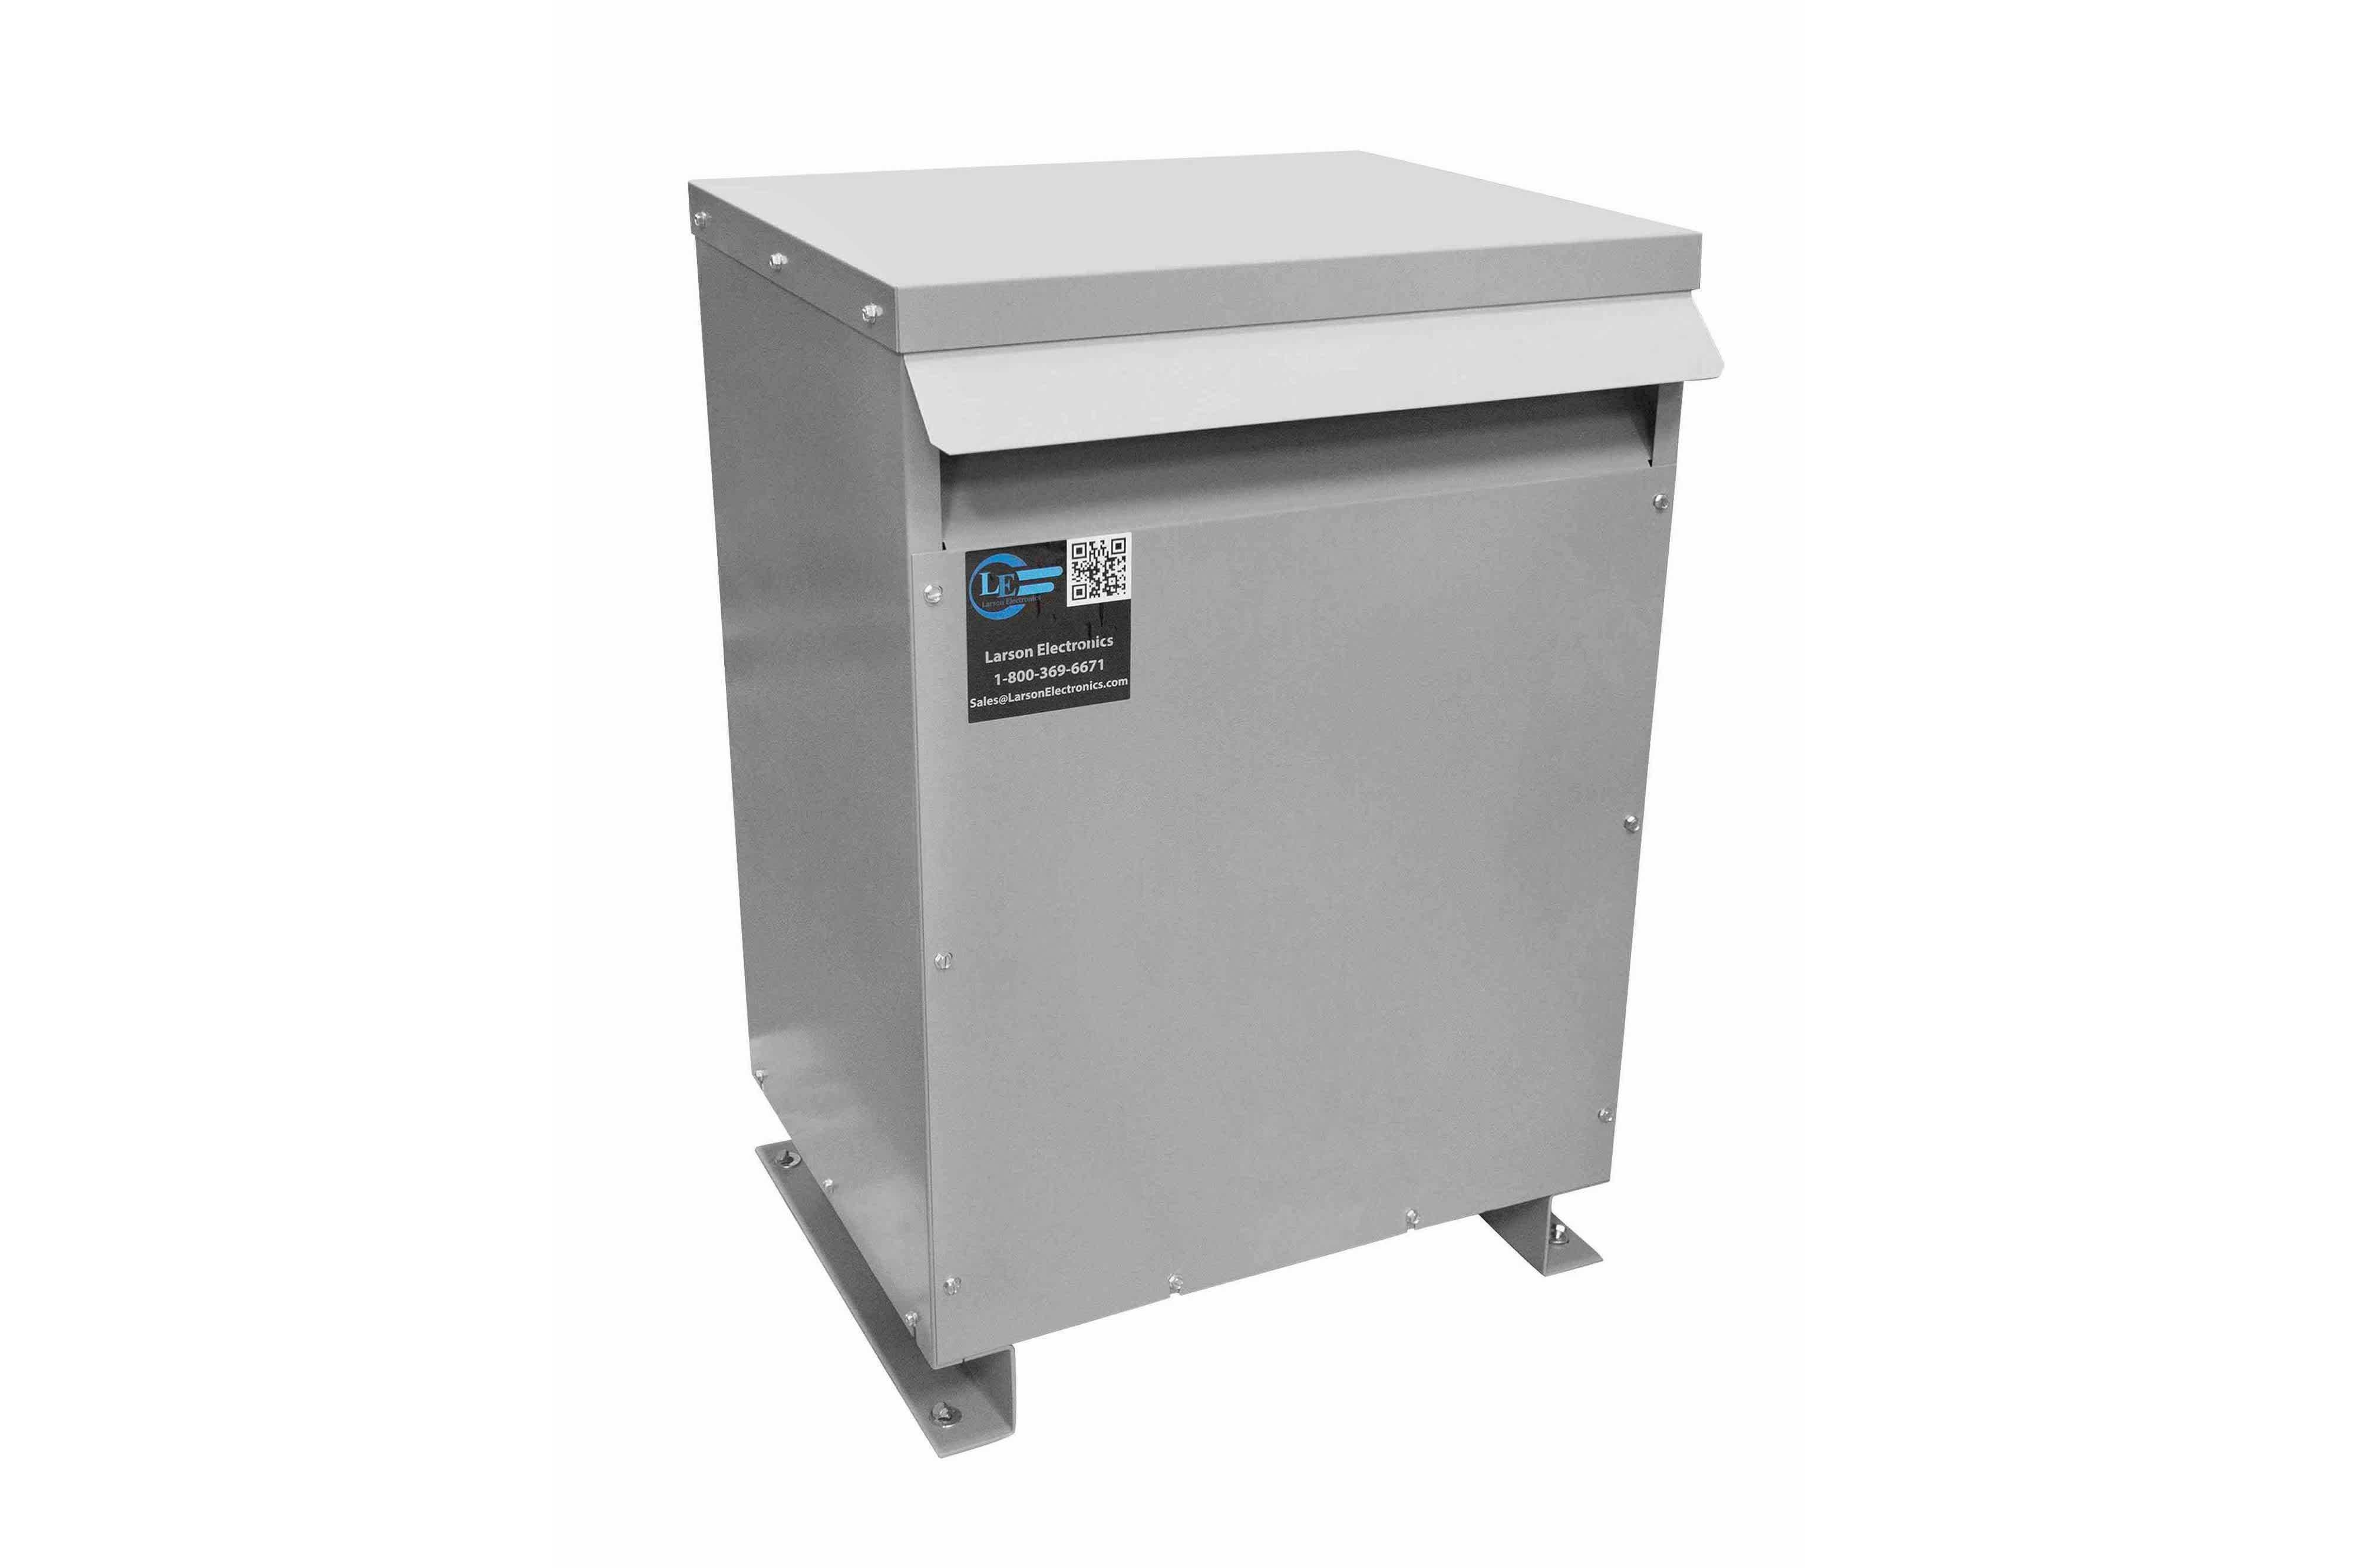 35 kVA 3PH Isolation Transformer, 480V Wye Primary, 600Y/347 Wye-N Secondary, N3R, Ventilated, 60 Hz